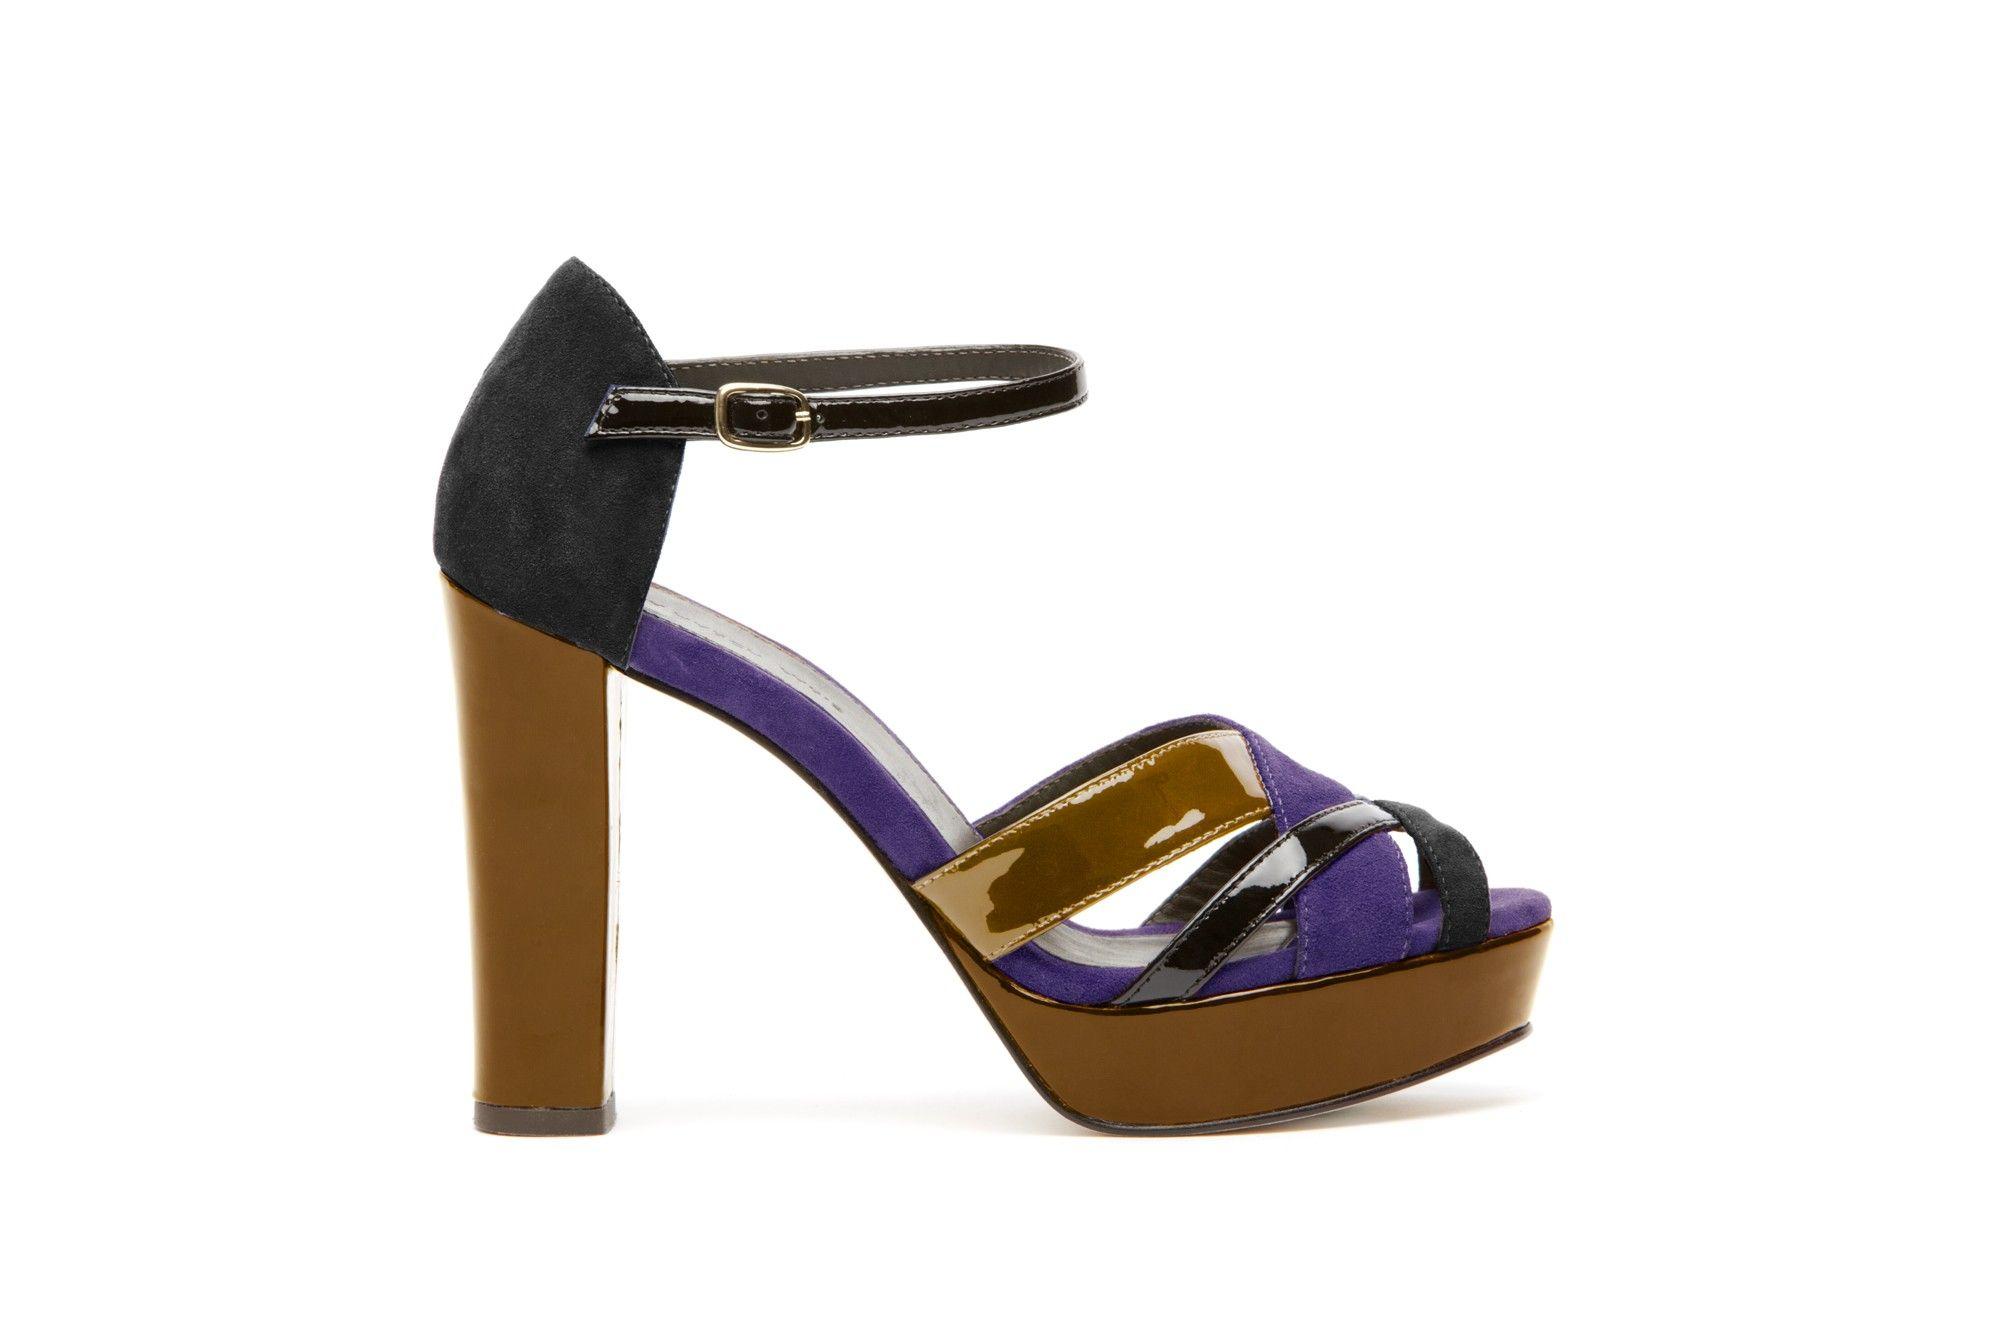 Chaussures - Sandales Mars Tila vCMgg6qgHC